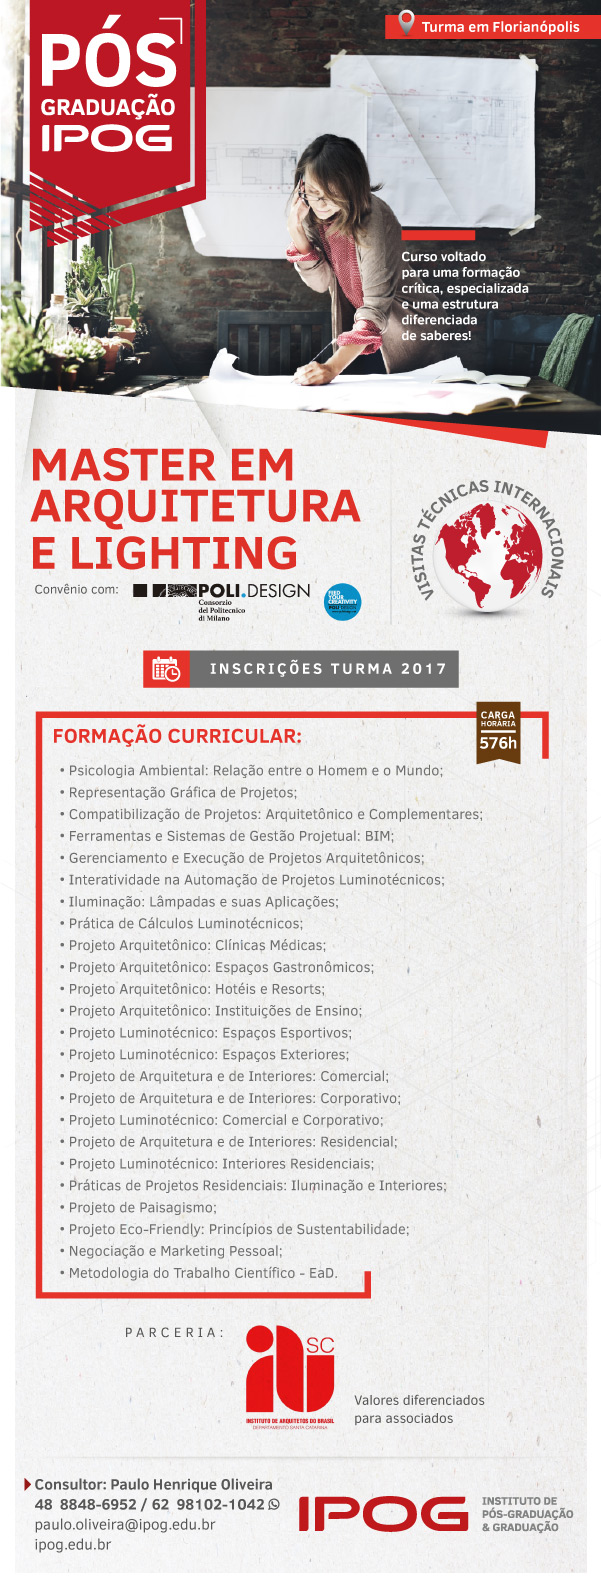 whatsapp-master-em-arquitetura-lighting-floriano%c2%a6upolis-paulo-henrique-01